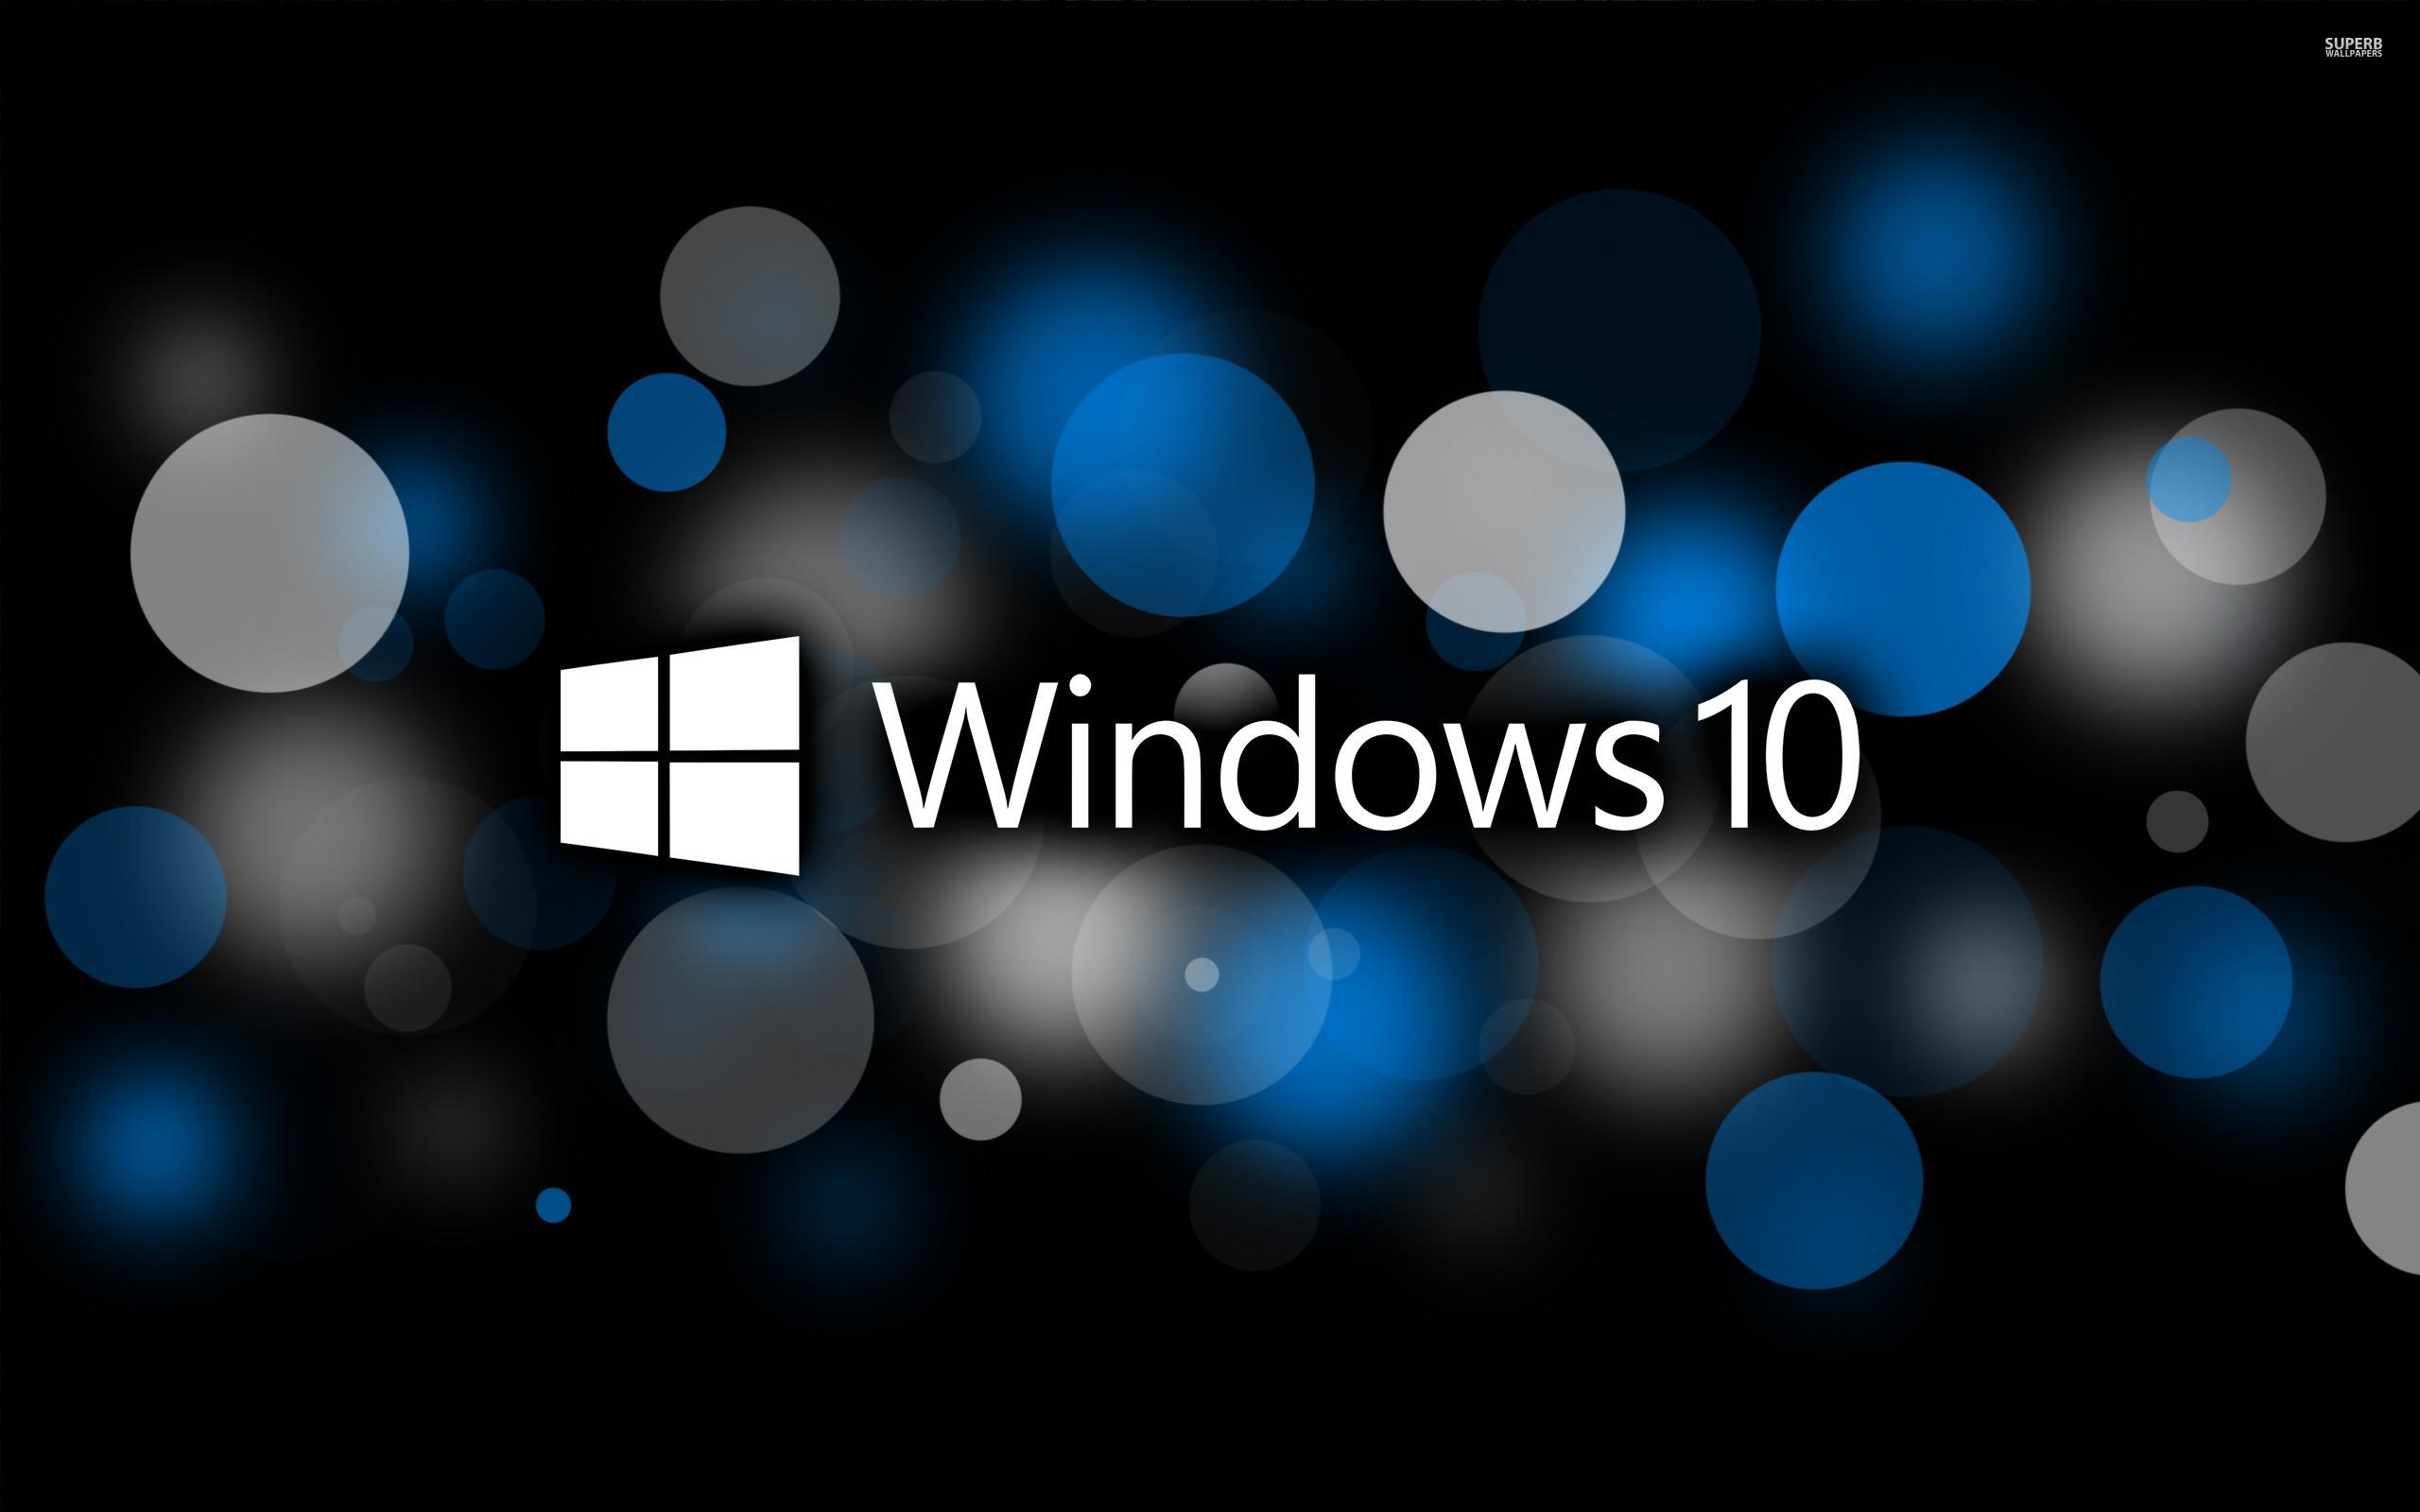 Nature Windows 10 Wallpapers #12350 Wallpaper   Download HD Wallpaper